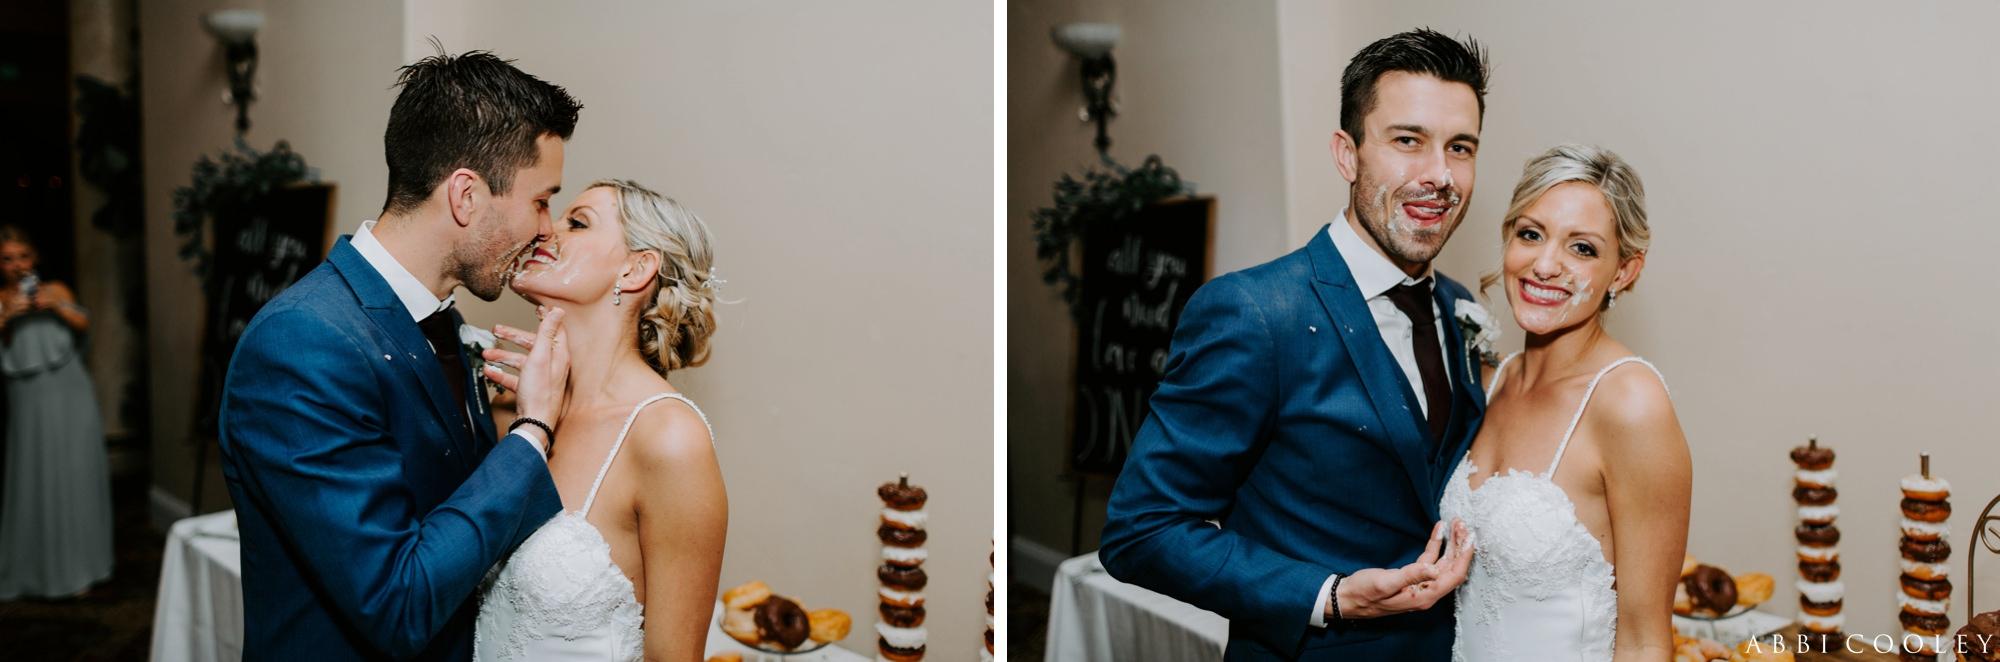 ABBI COOLEY WILSON CREEK WINERY TEMECULA WEDDING_0883